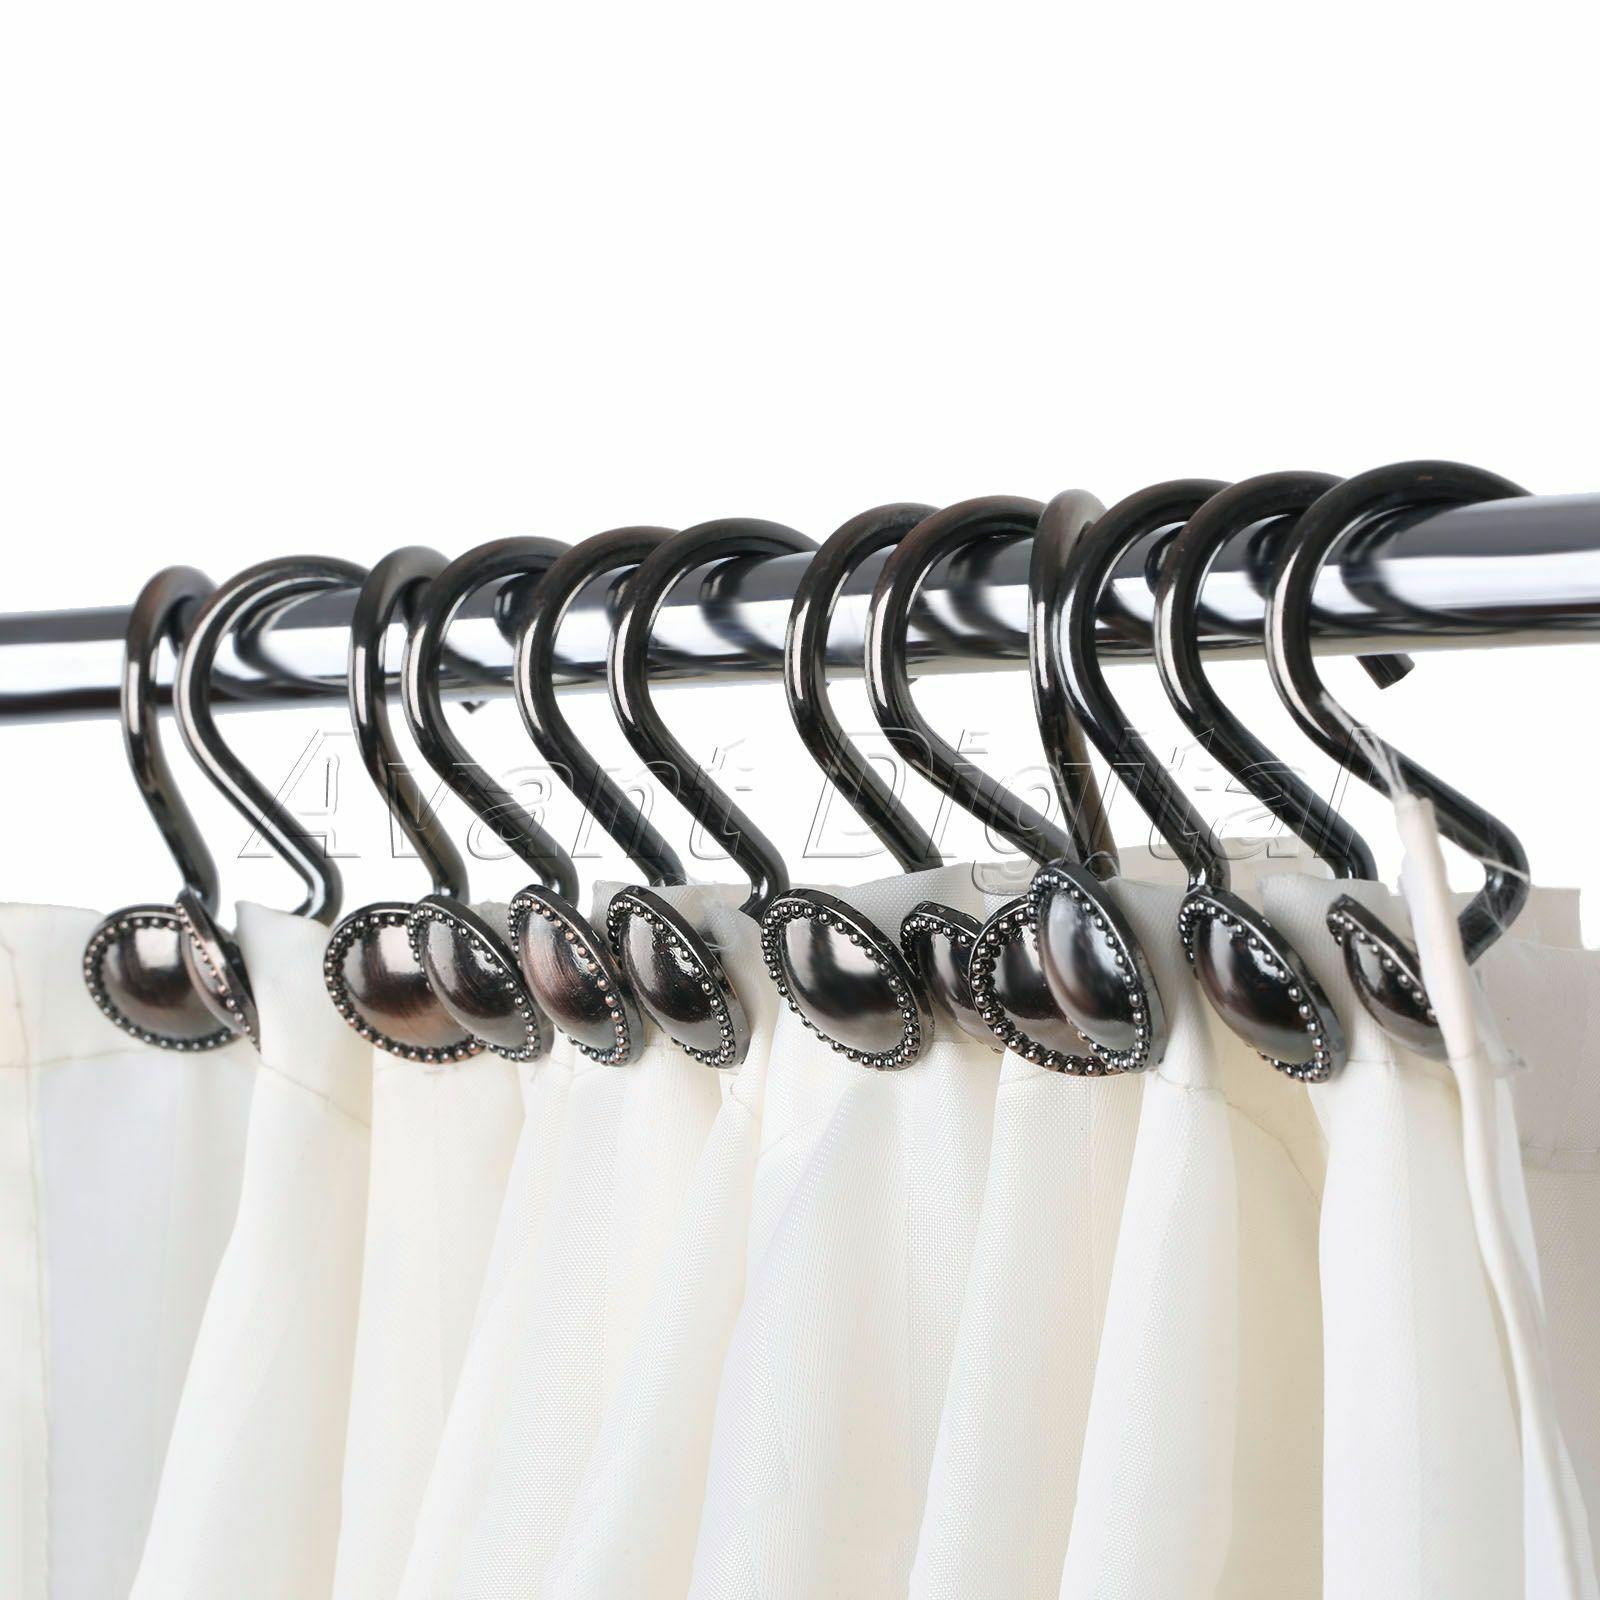 Metal Shower Curtain Hooks Vintage Shower Curtain Rings Zinc Alloy Bronze Color